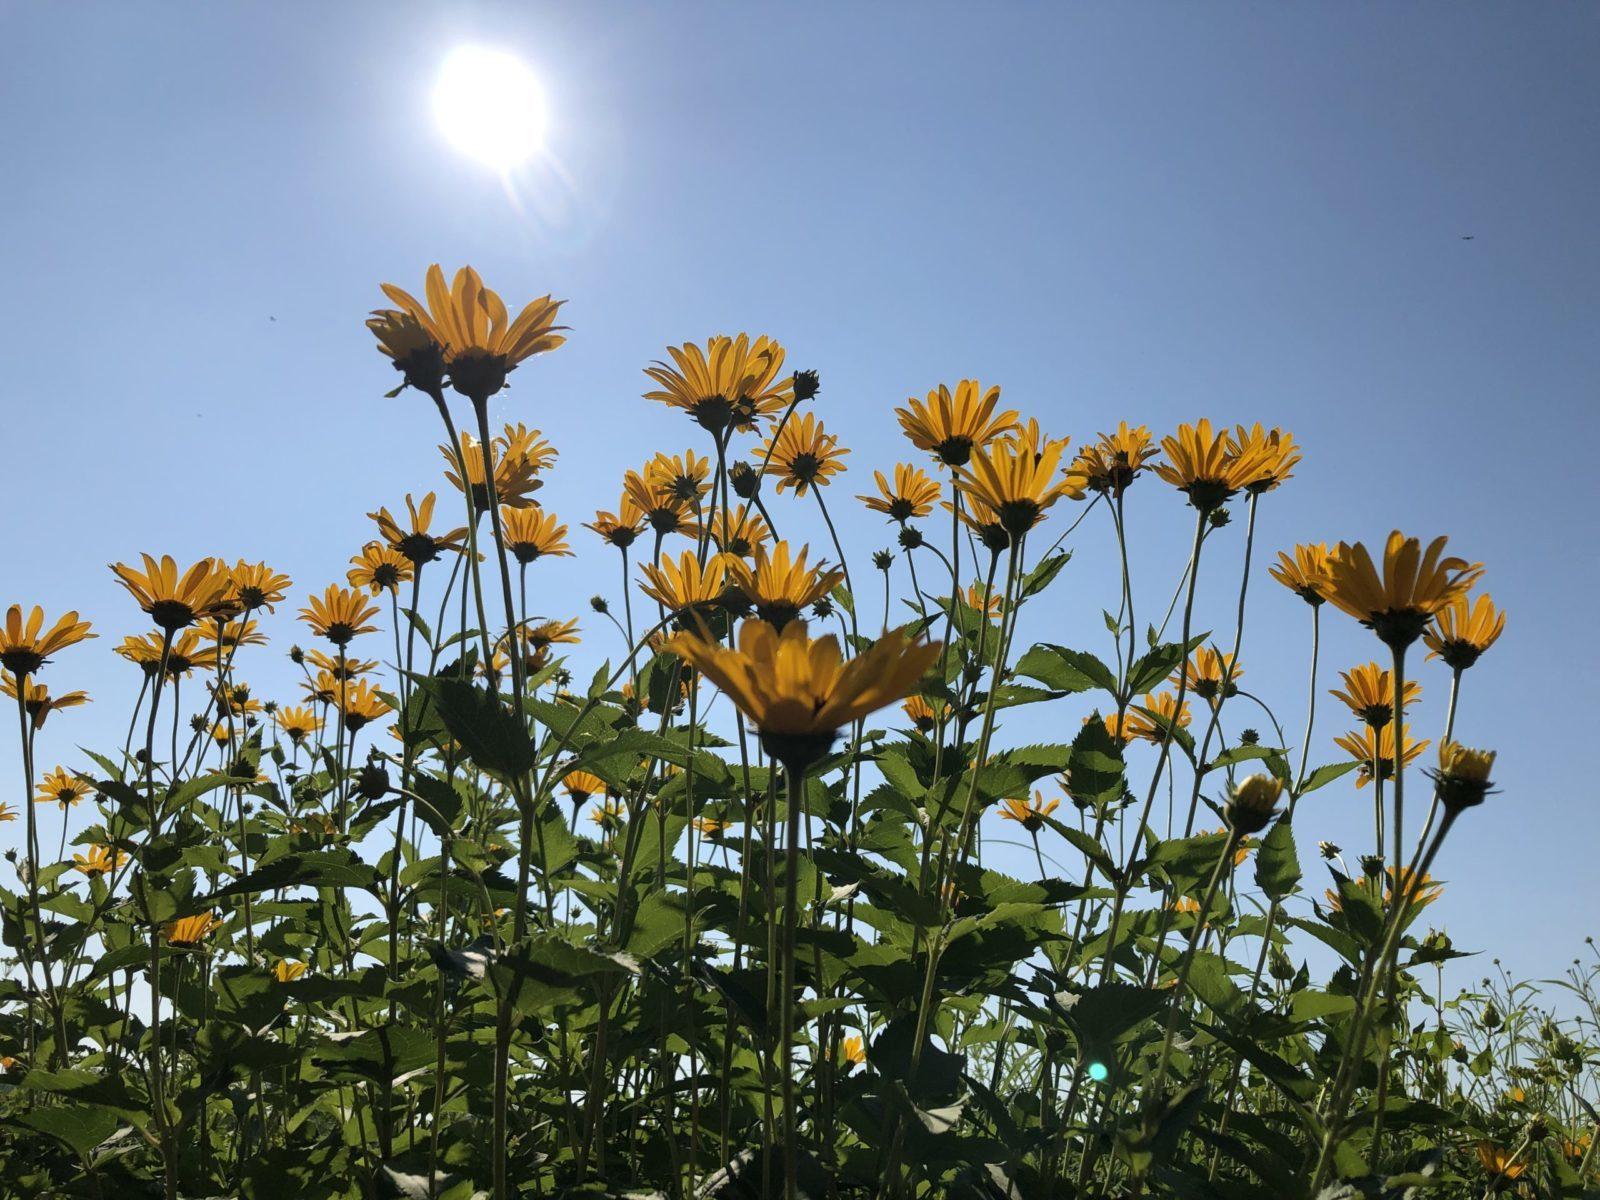 Yellow Daisies in the sun